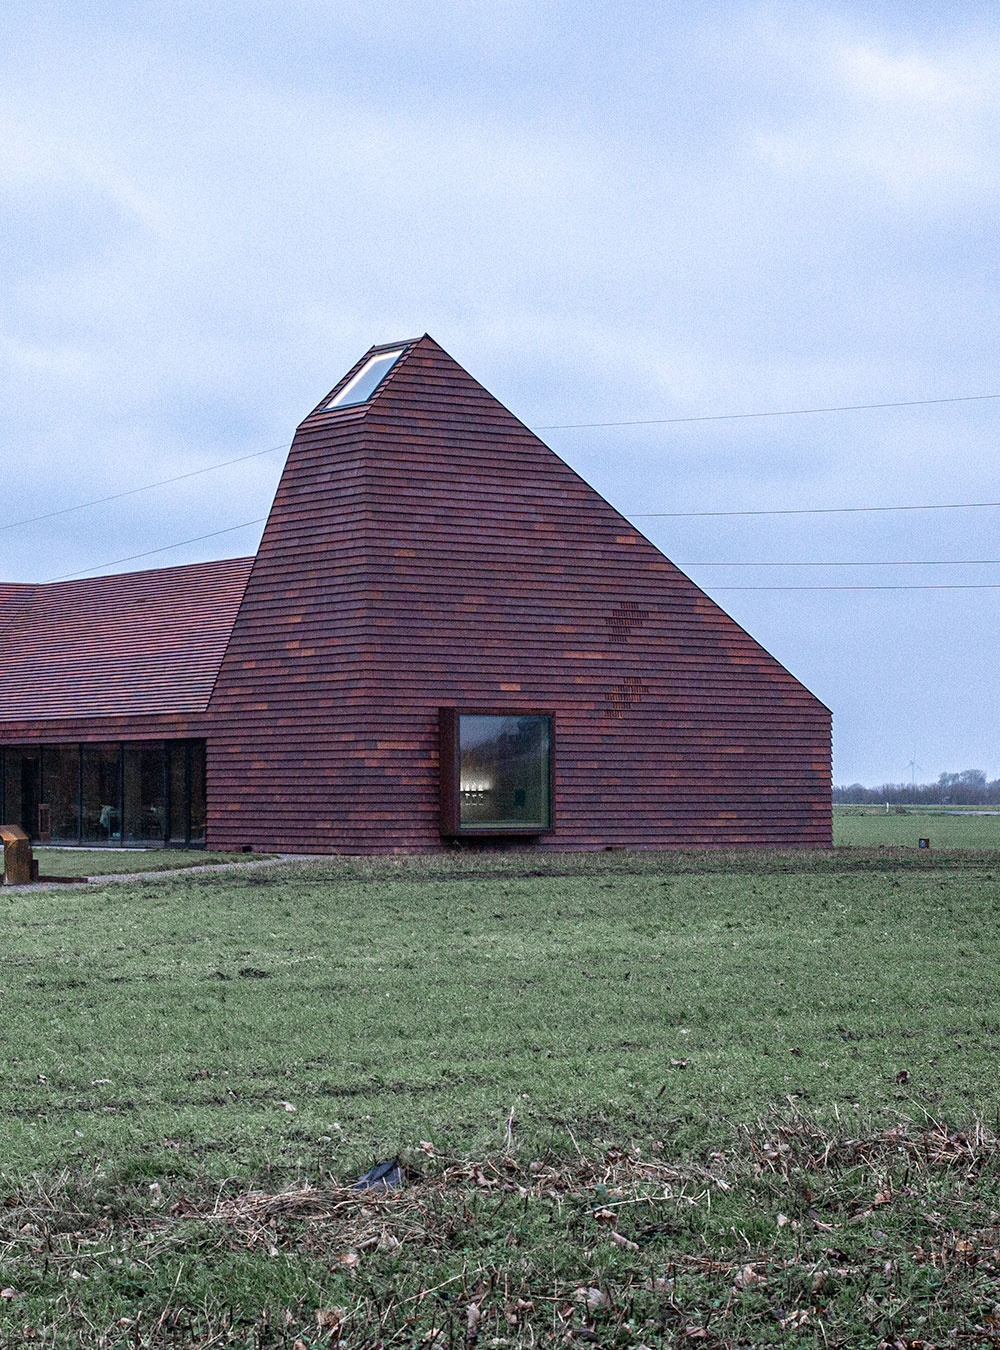 Kornets Hus | Reiulf Ramstad Architects